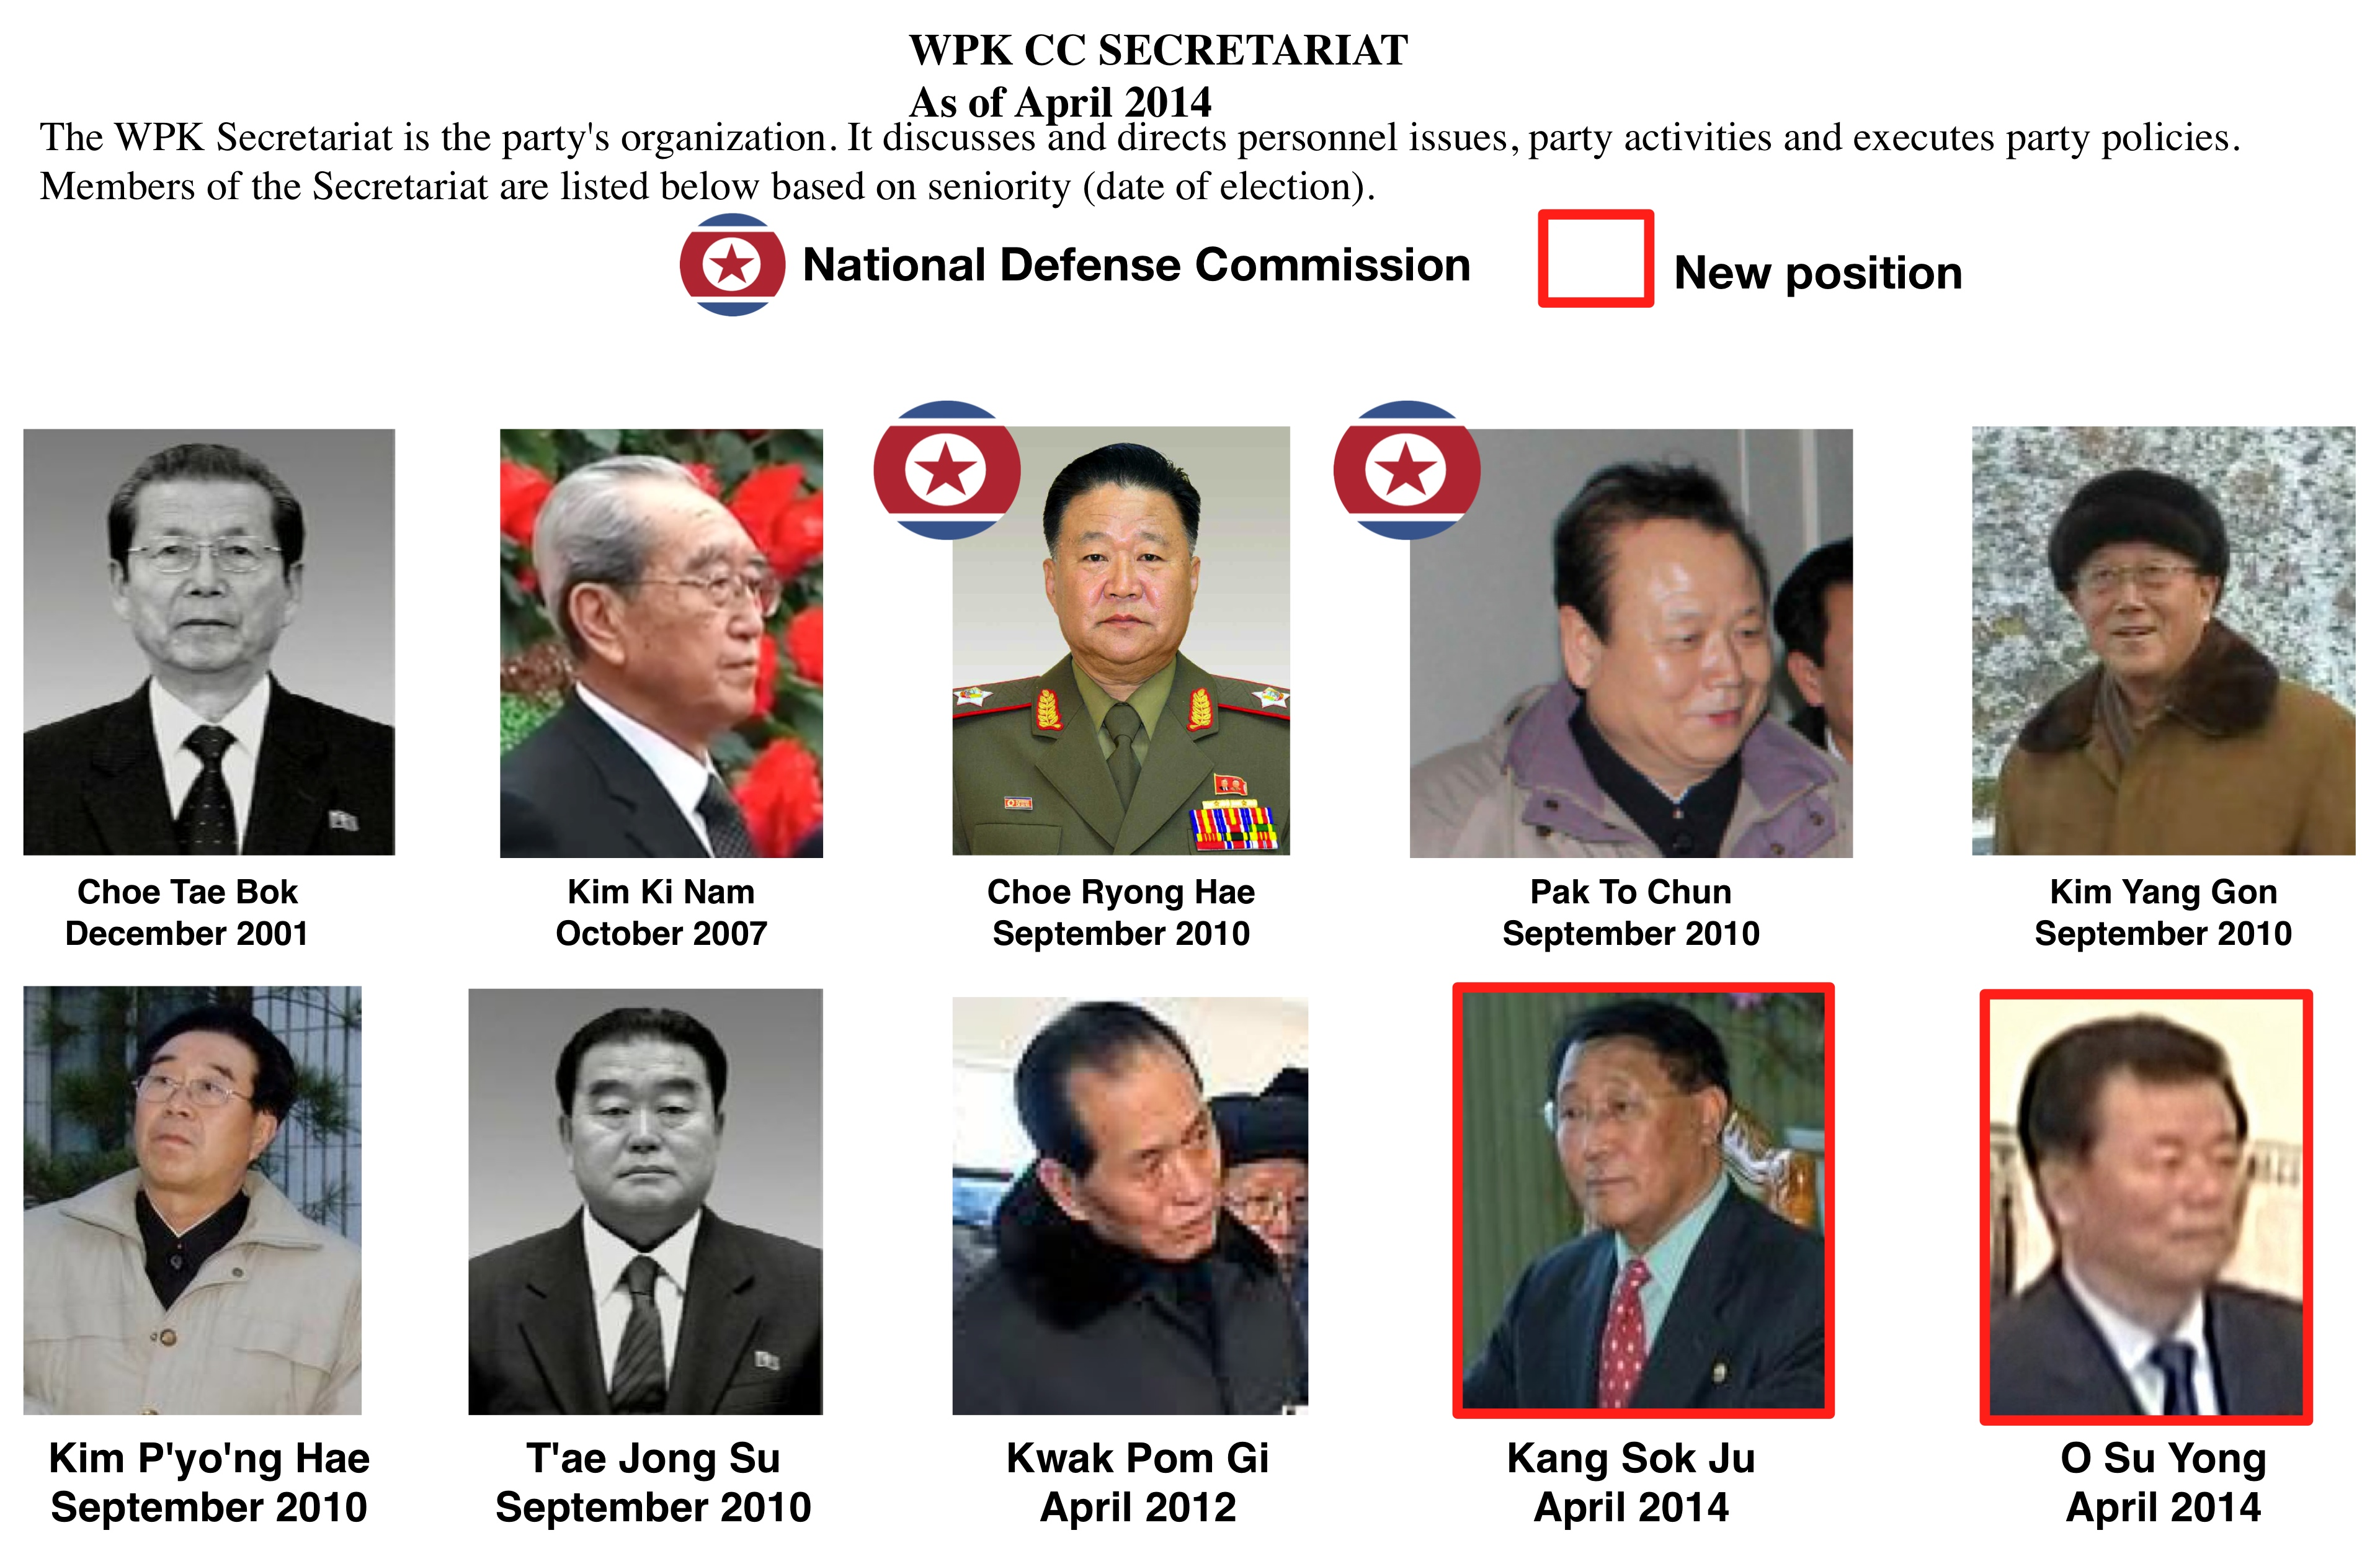 WPK Central Committee Secretariat (Graphic: NK Leadership Watch)